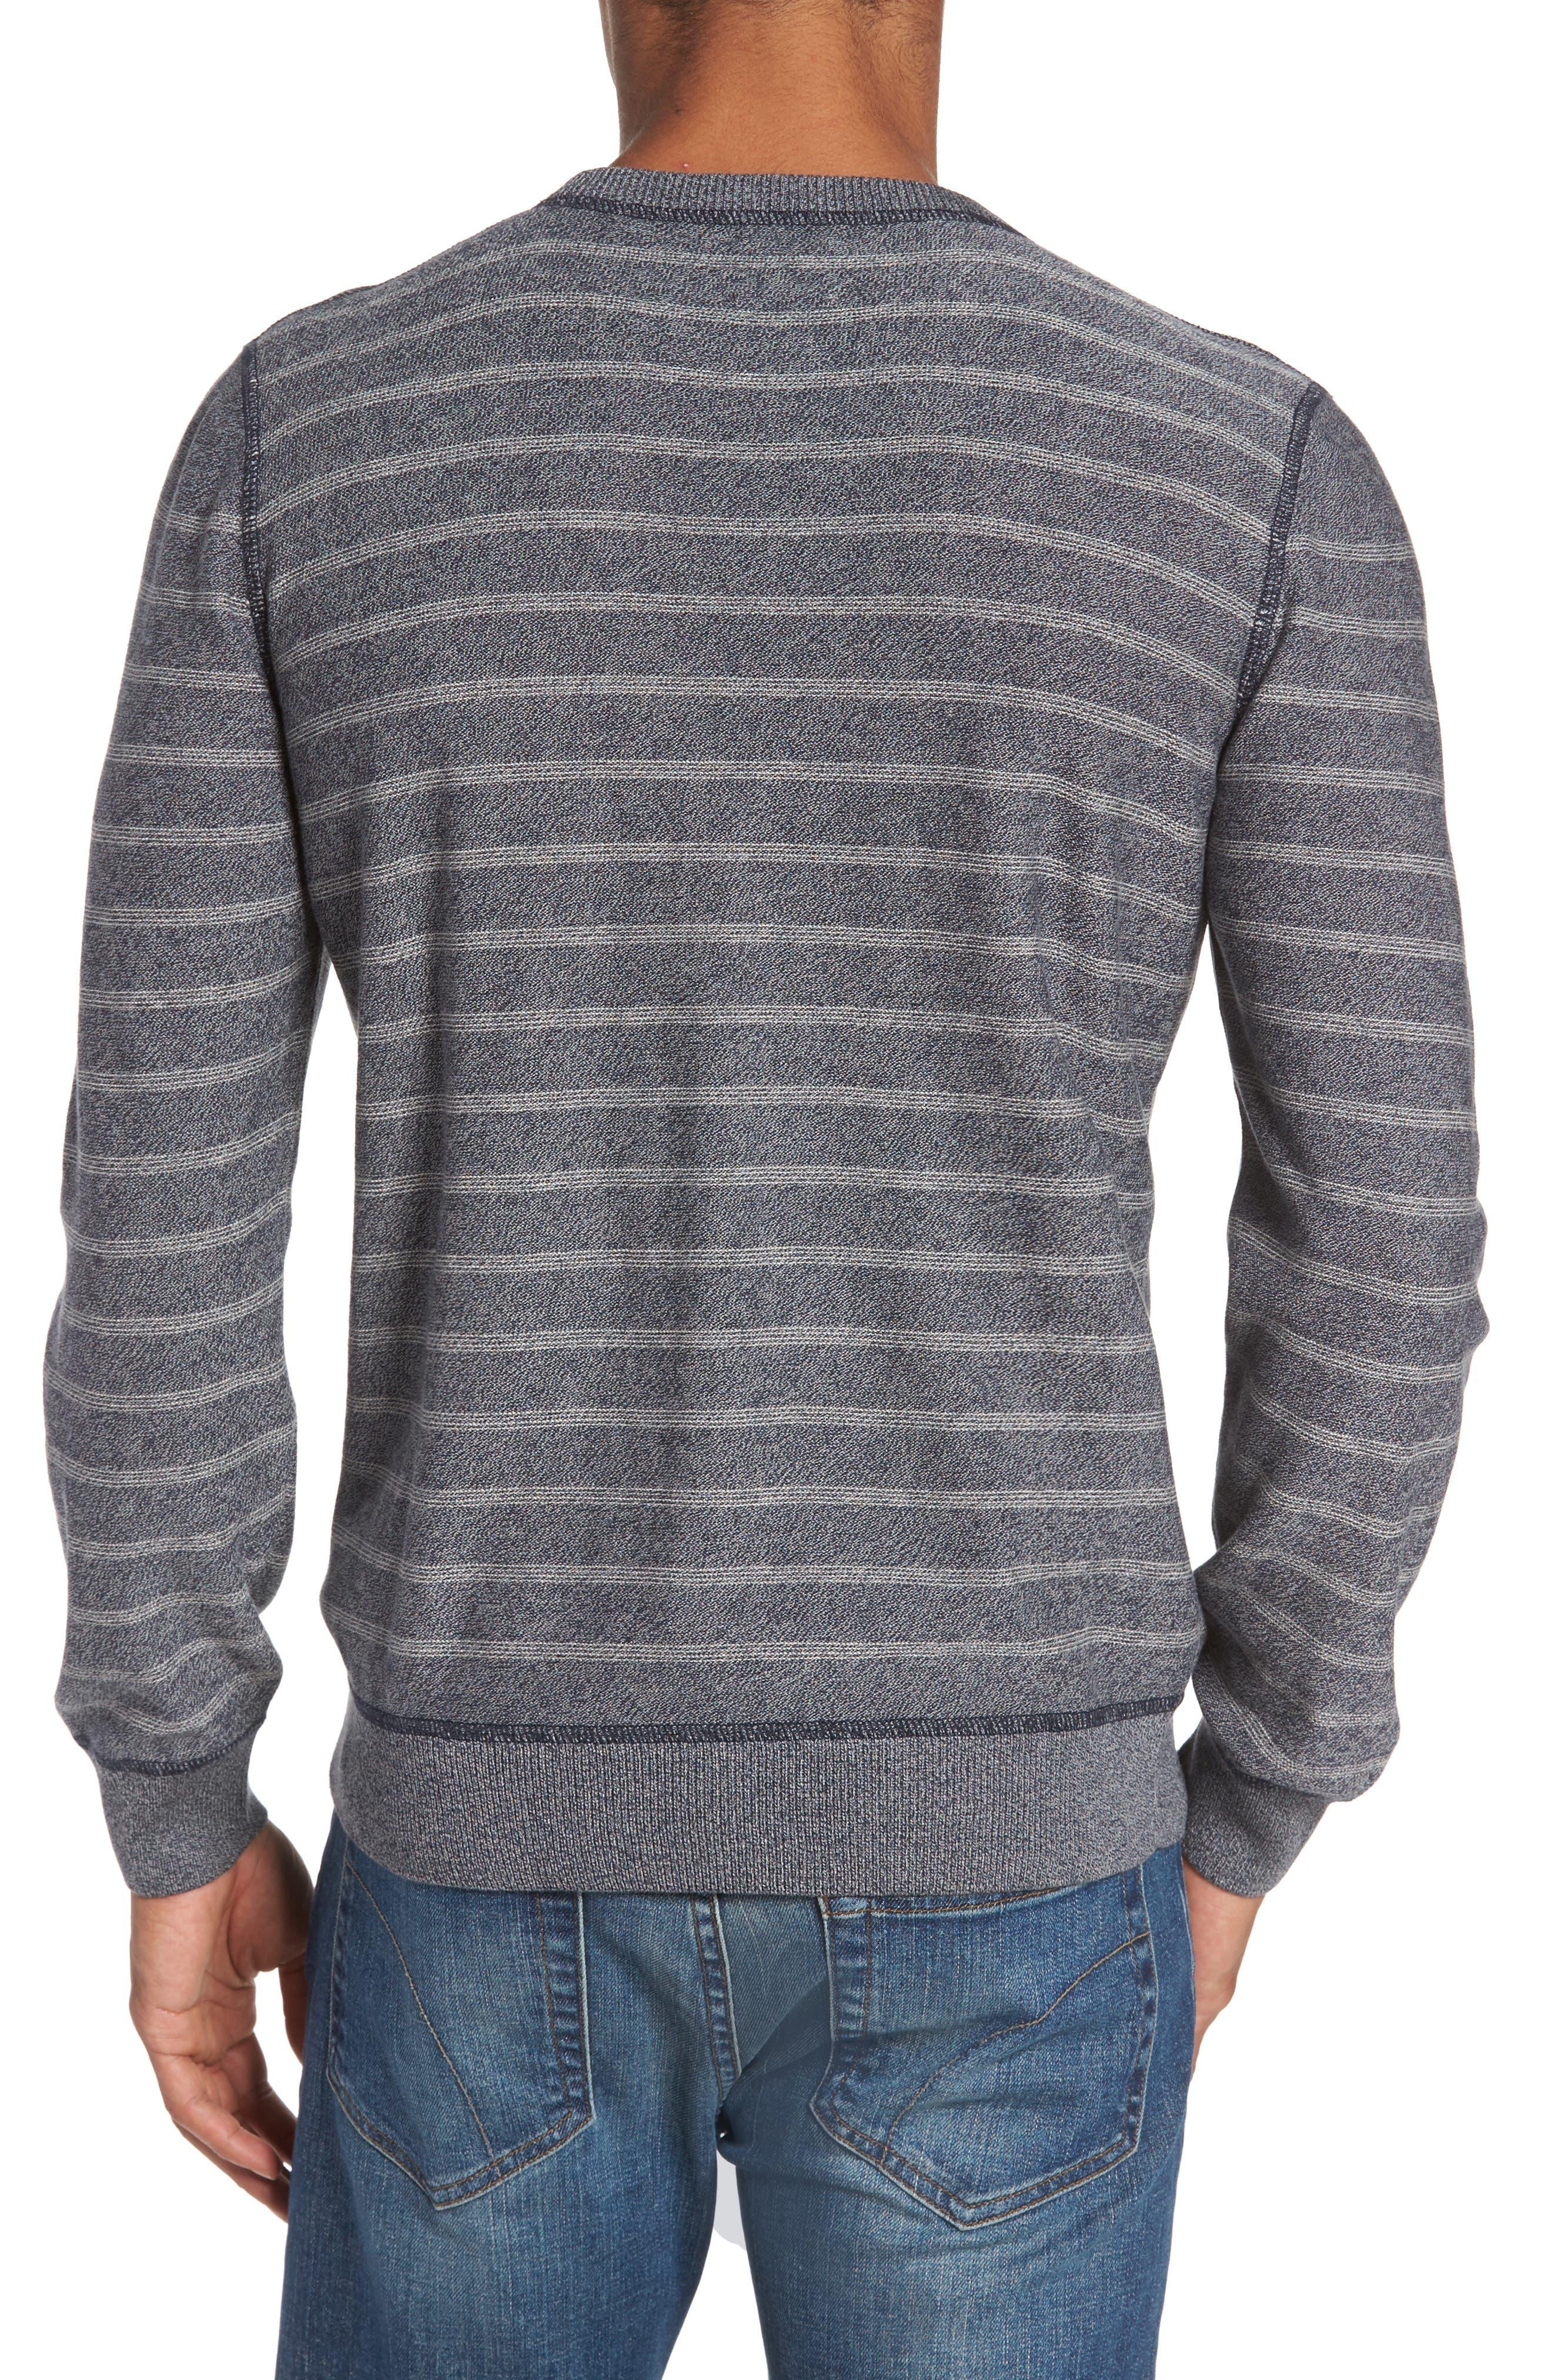 Tanner Crewneck Sweatshirt,                             Alternate thumbnail 2, color,                             021